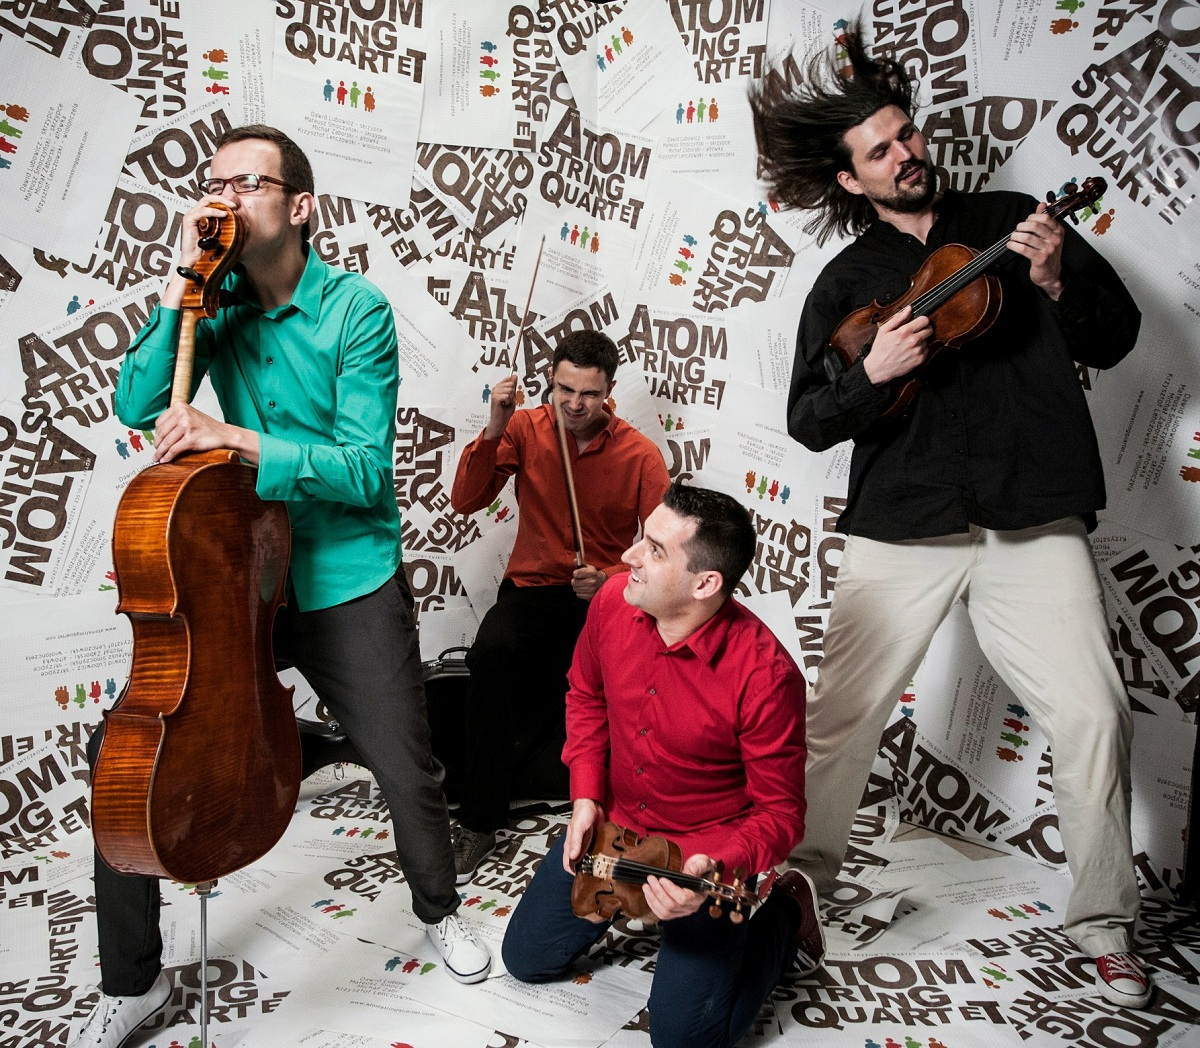 Atom String Quartet (źródło: mat. prasowe)